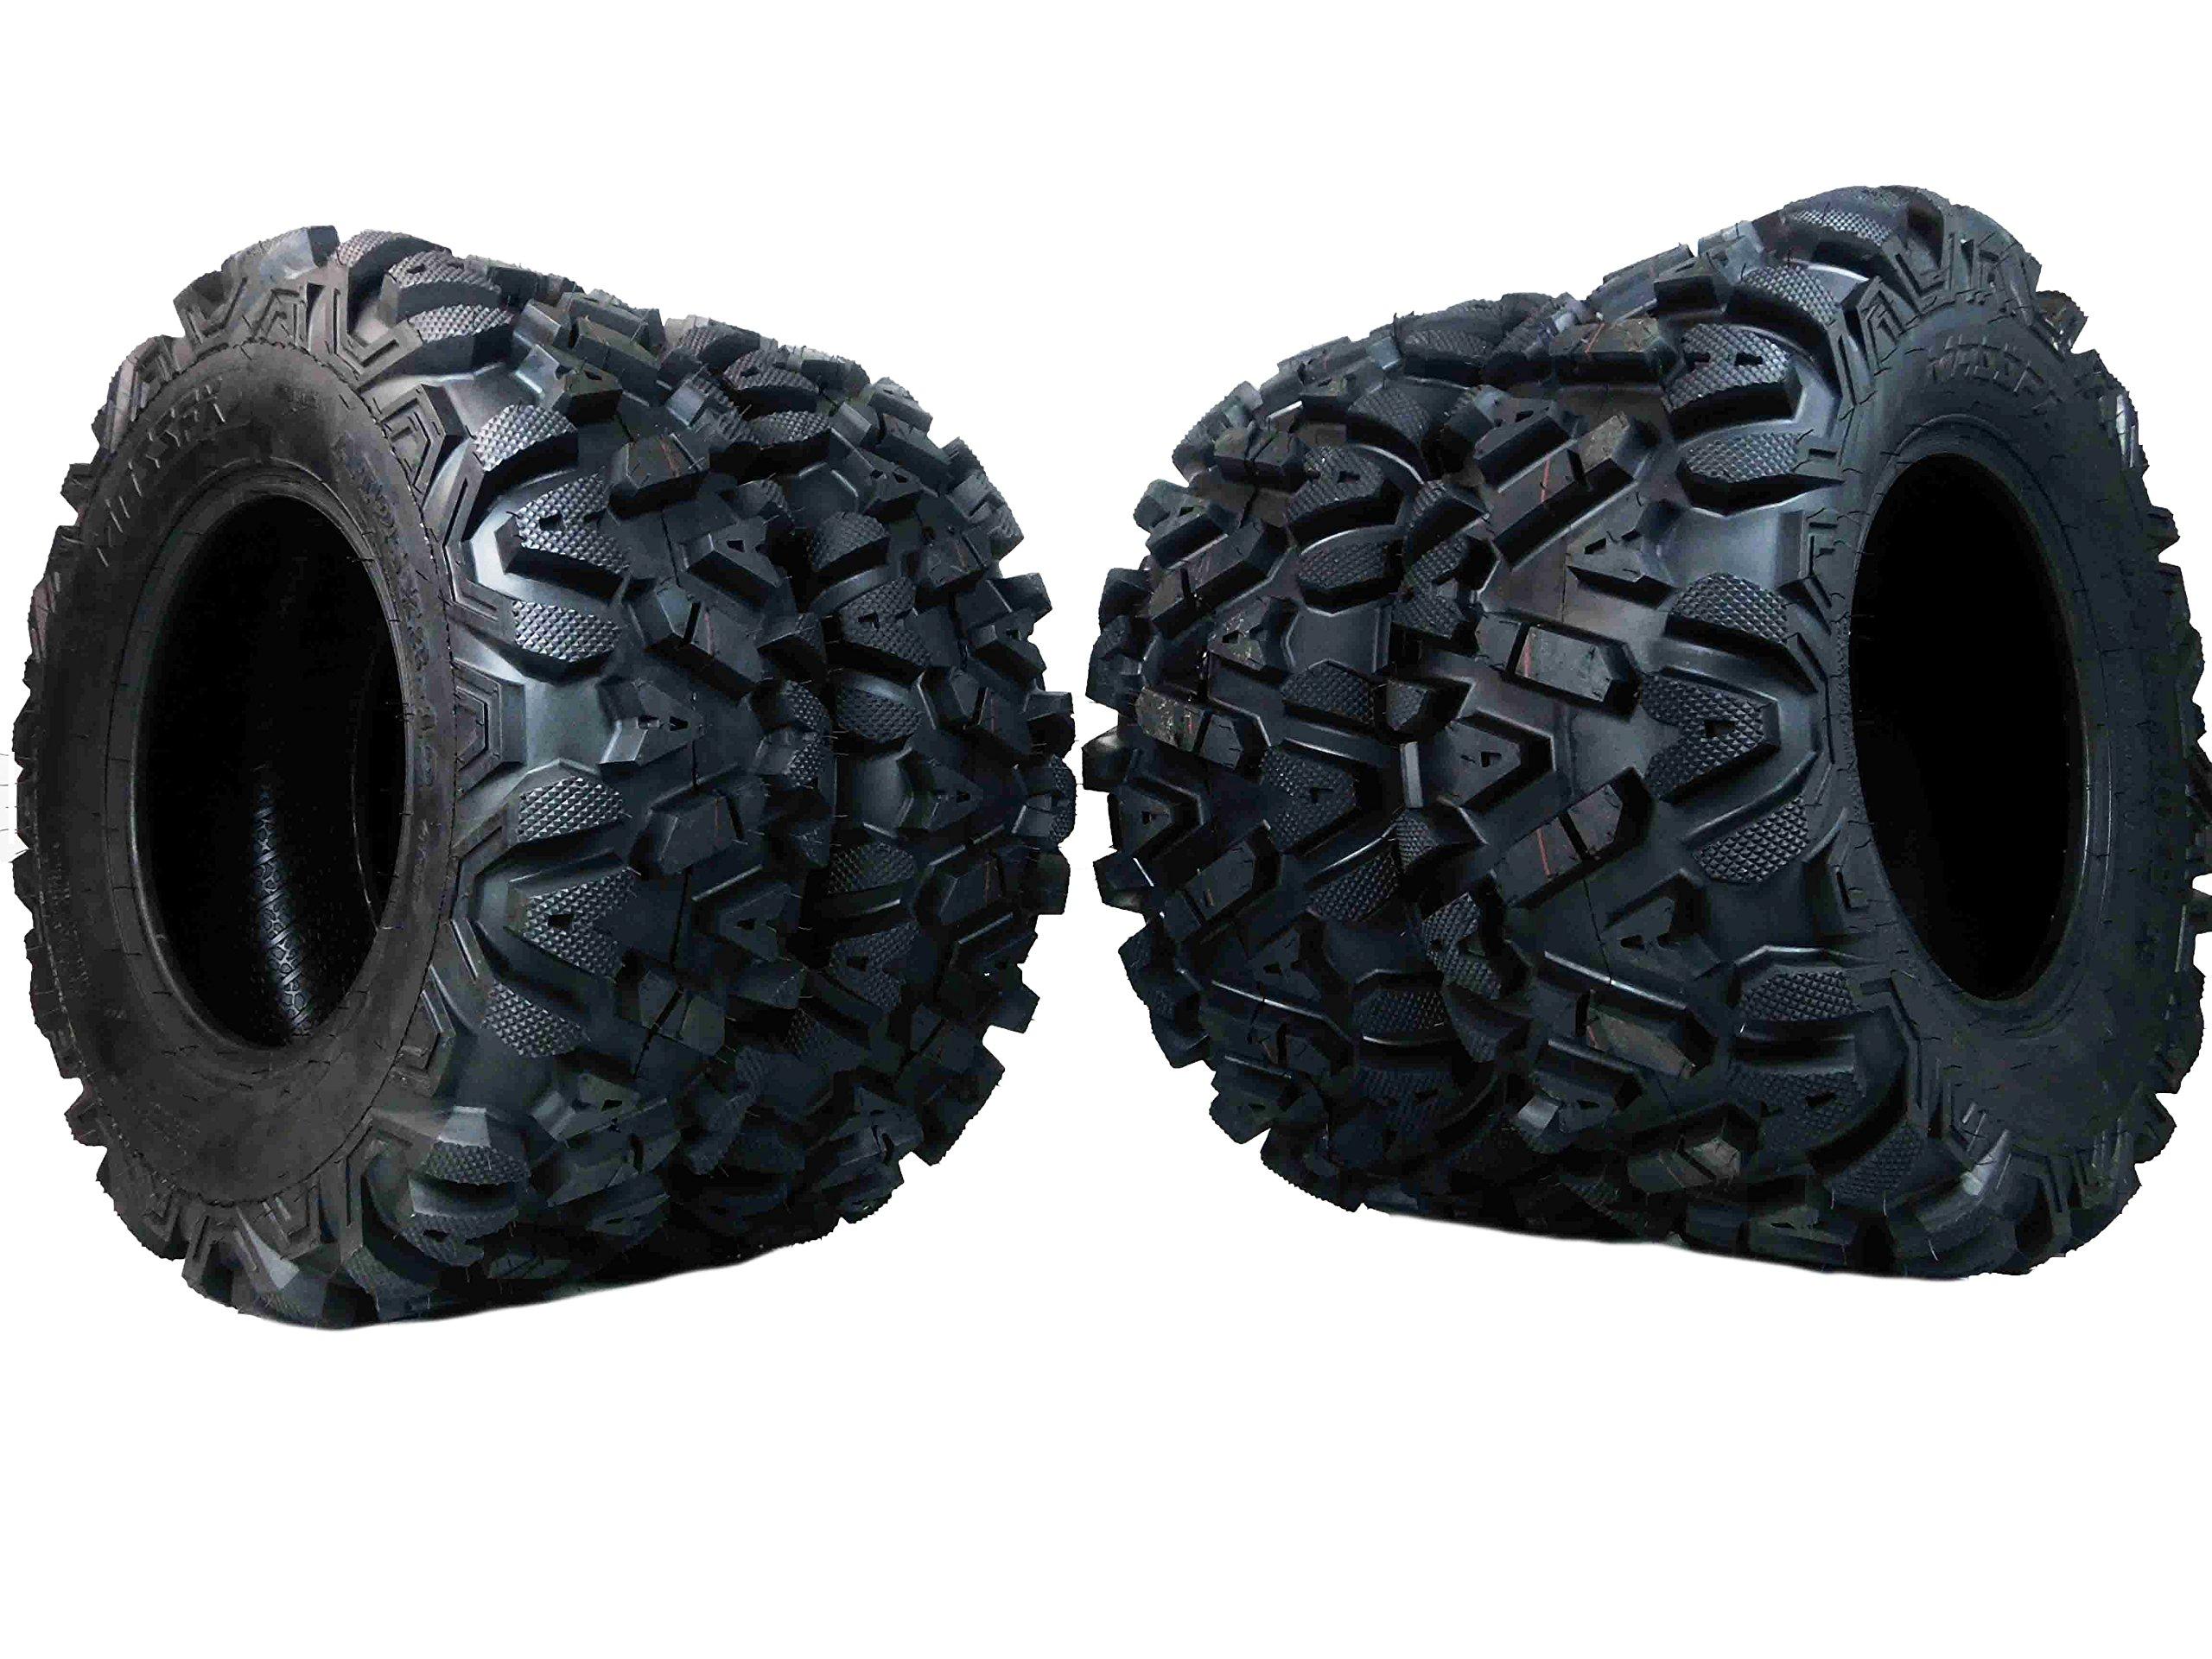 4 New 25x8-12 25x10-12 KT MASSFX TIRE SET ATV TIRES 6 PLY 25'' 25x8x12 25x10x12